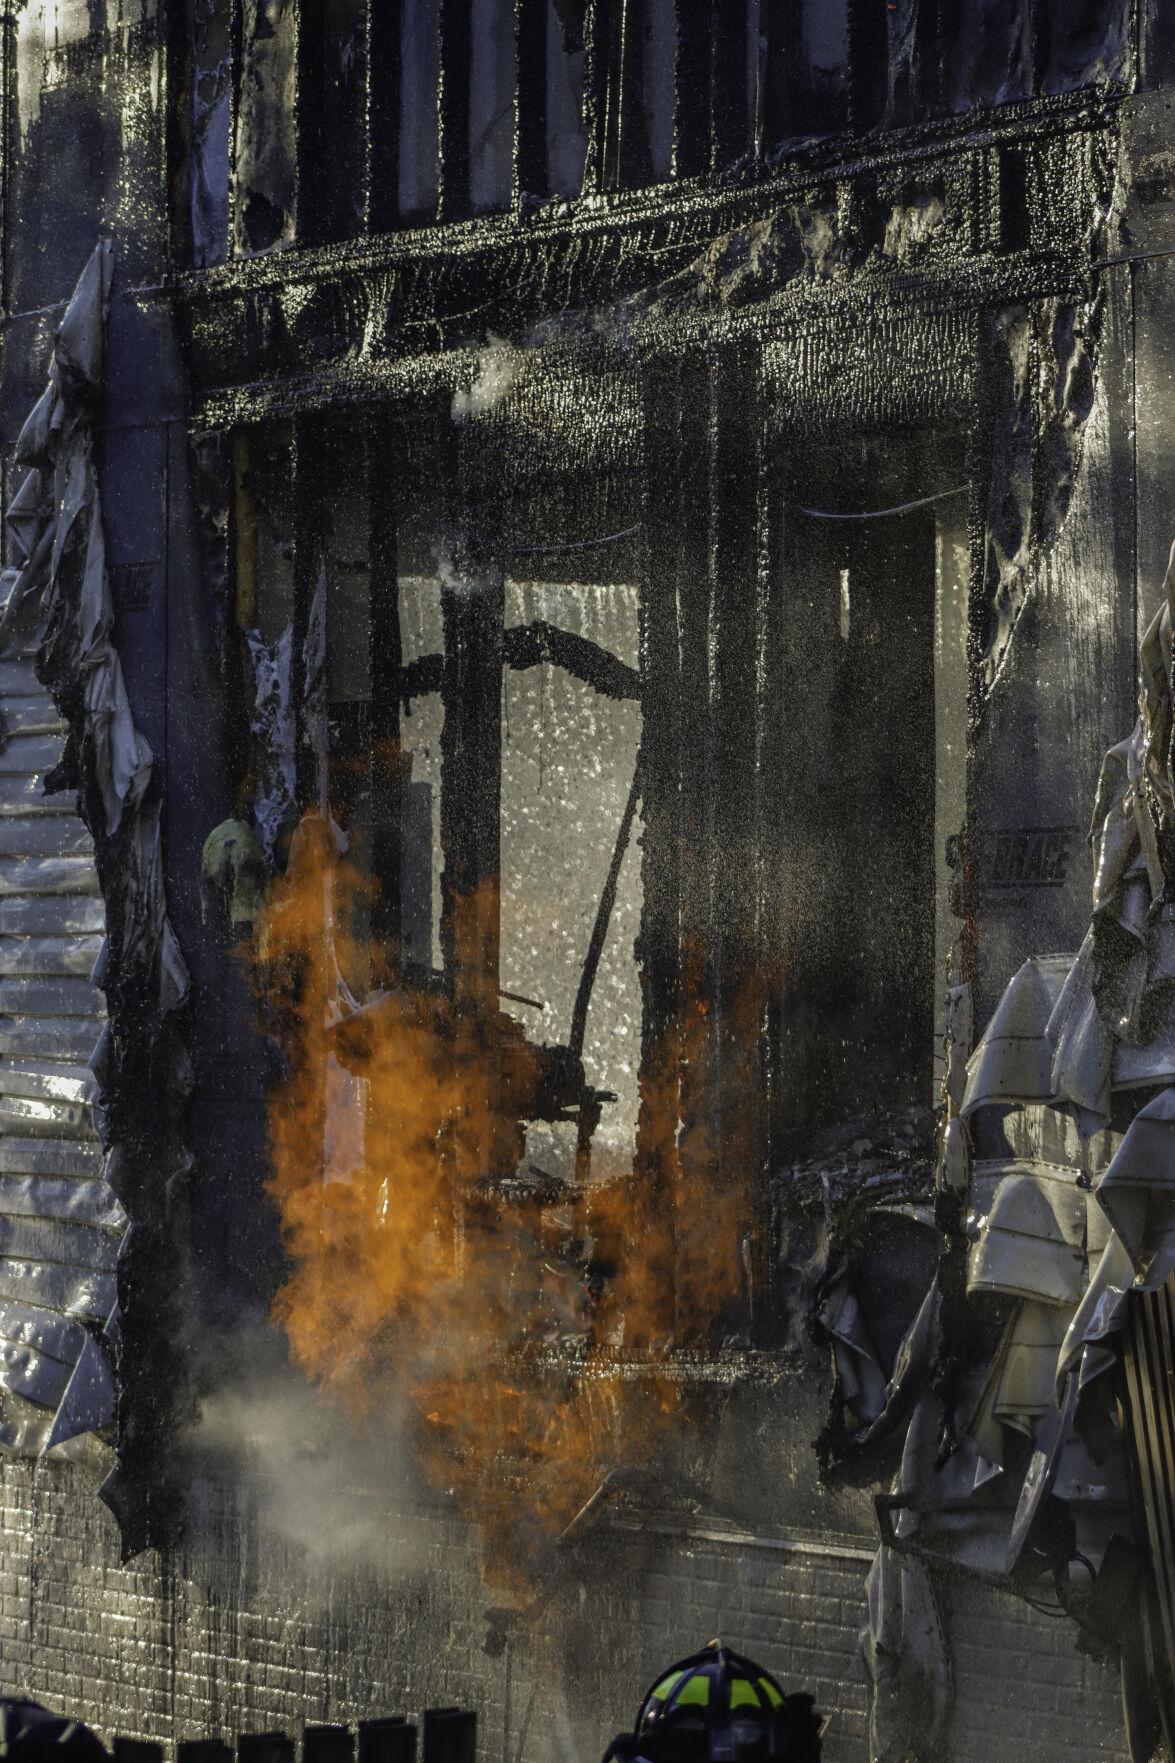 House_Fire_2JC Photography 2021 - -132.jpg